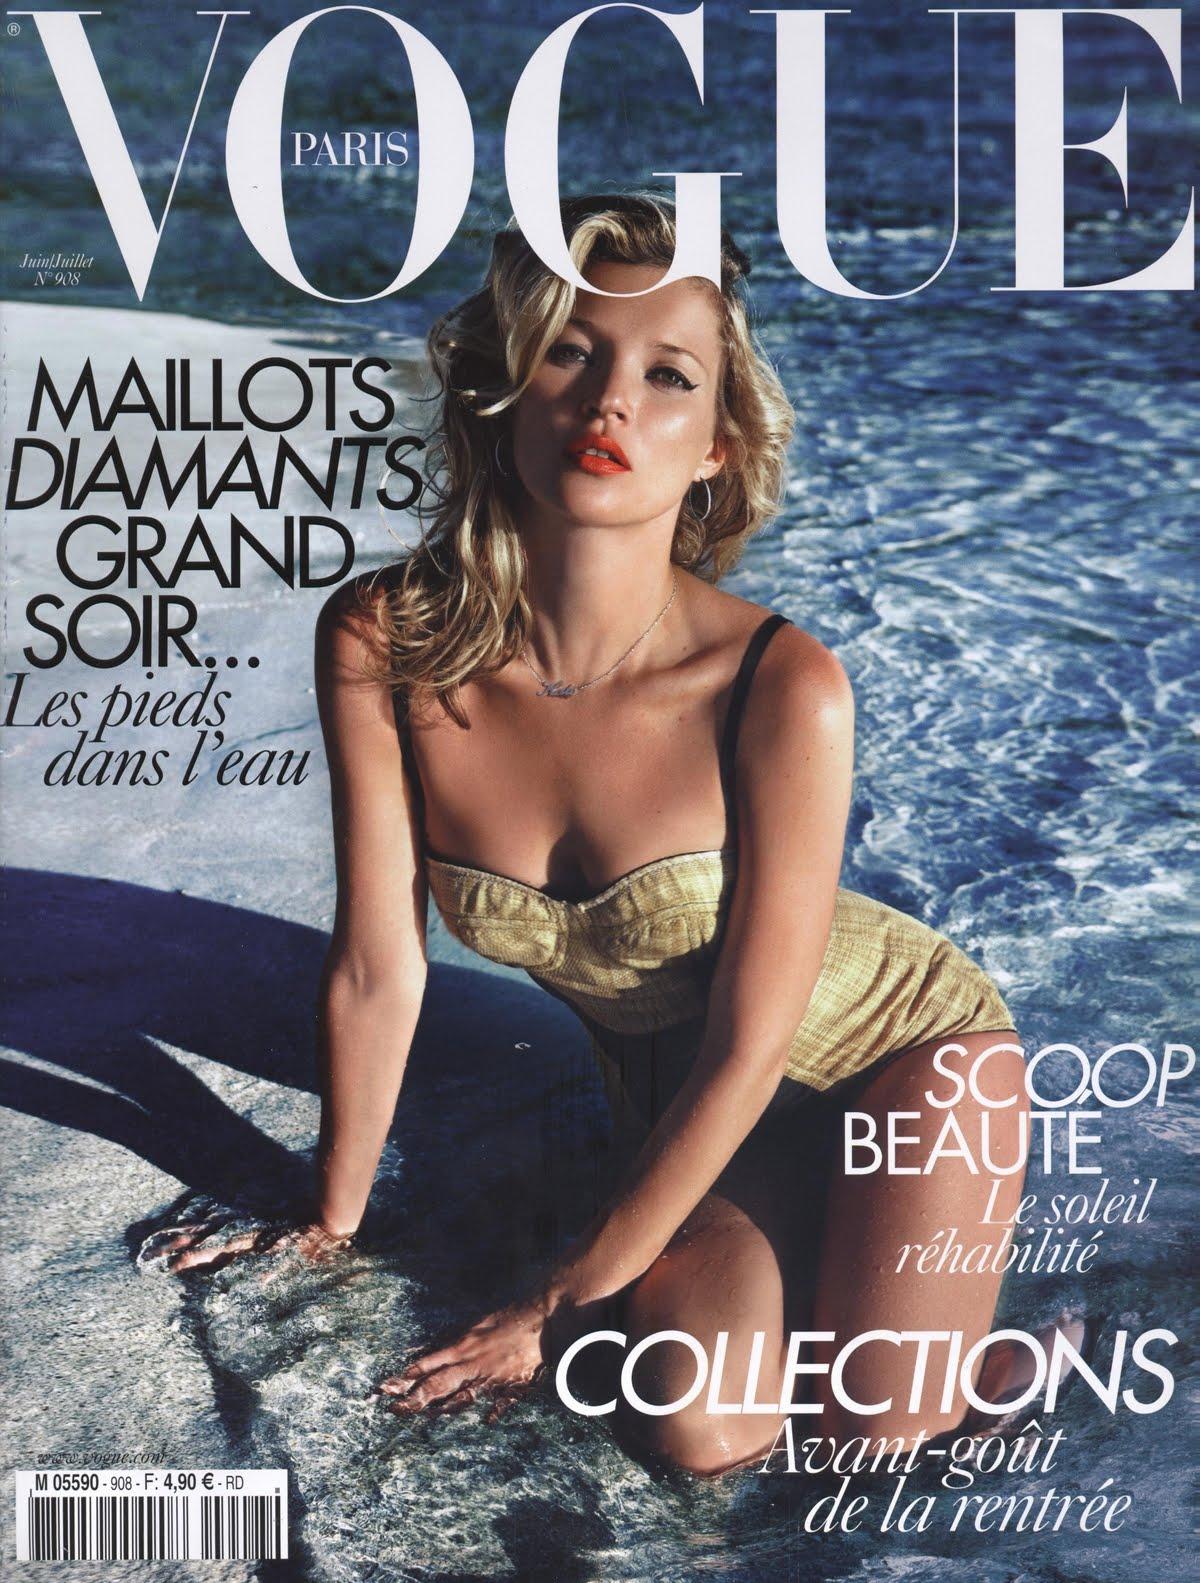 http://3.bp.blogspot.com/_FUYvMNTJrjU/TBgaxnc-BiI/AAAAAAAABJo/-pye8ETkpiA/s1600/Kate+Moss+Vogue+Paris+JuneJuly.jpg